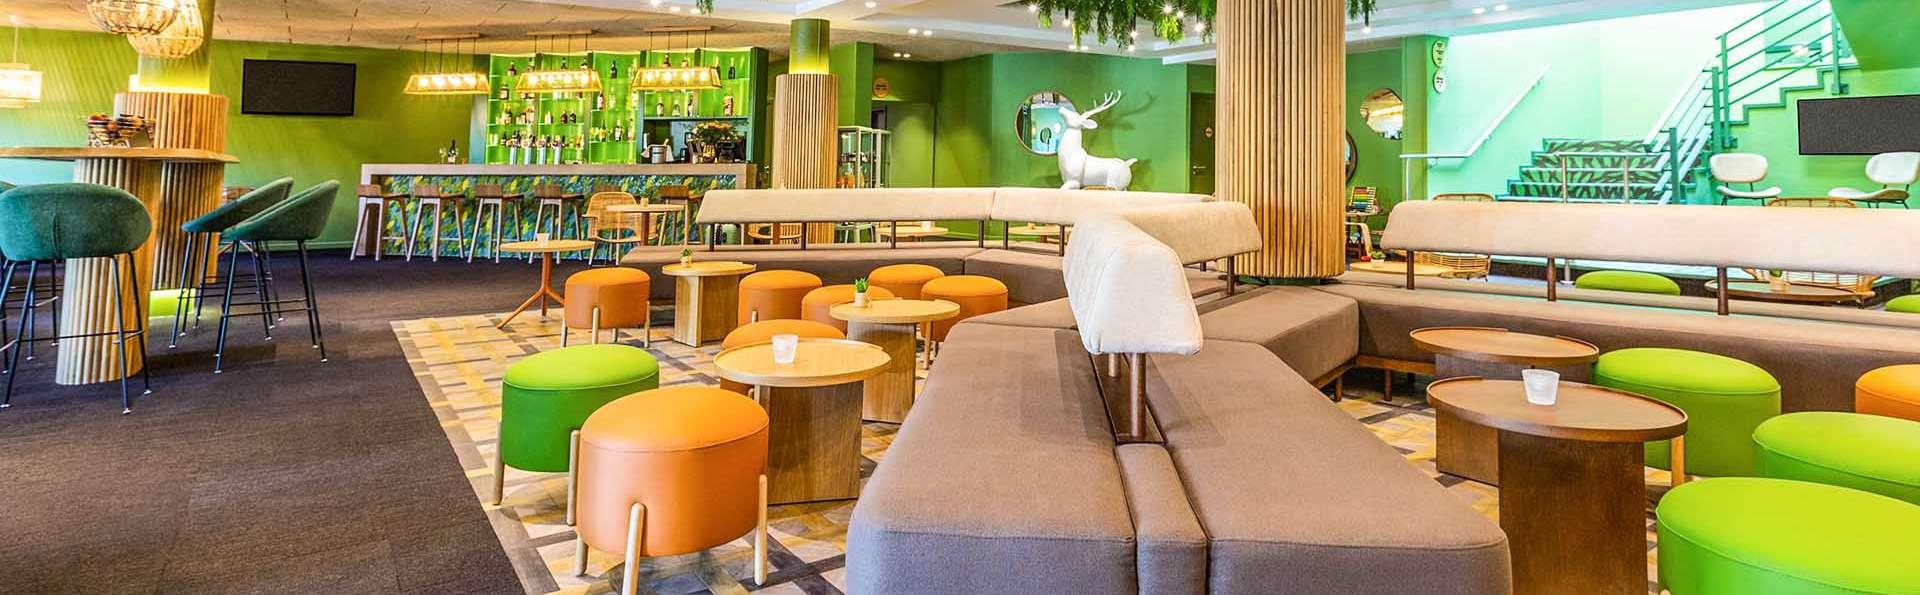 Hotel Arlon by Accor - EDIT_LOUNGE_01.jpg